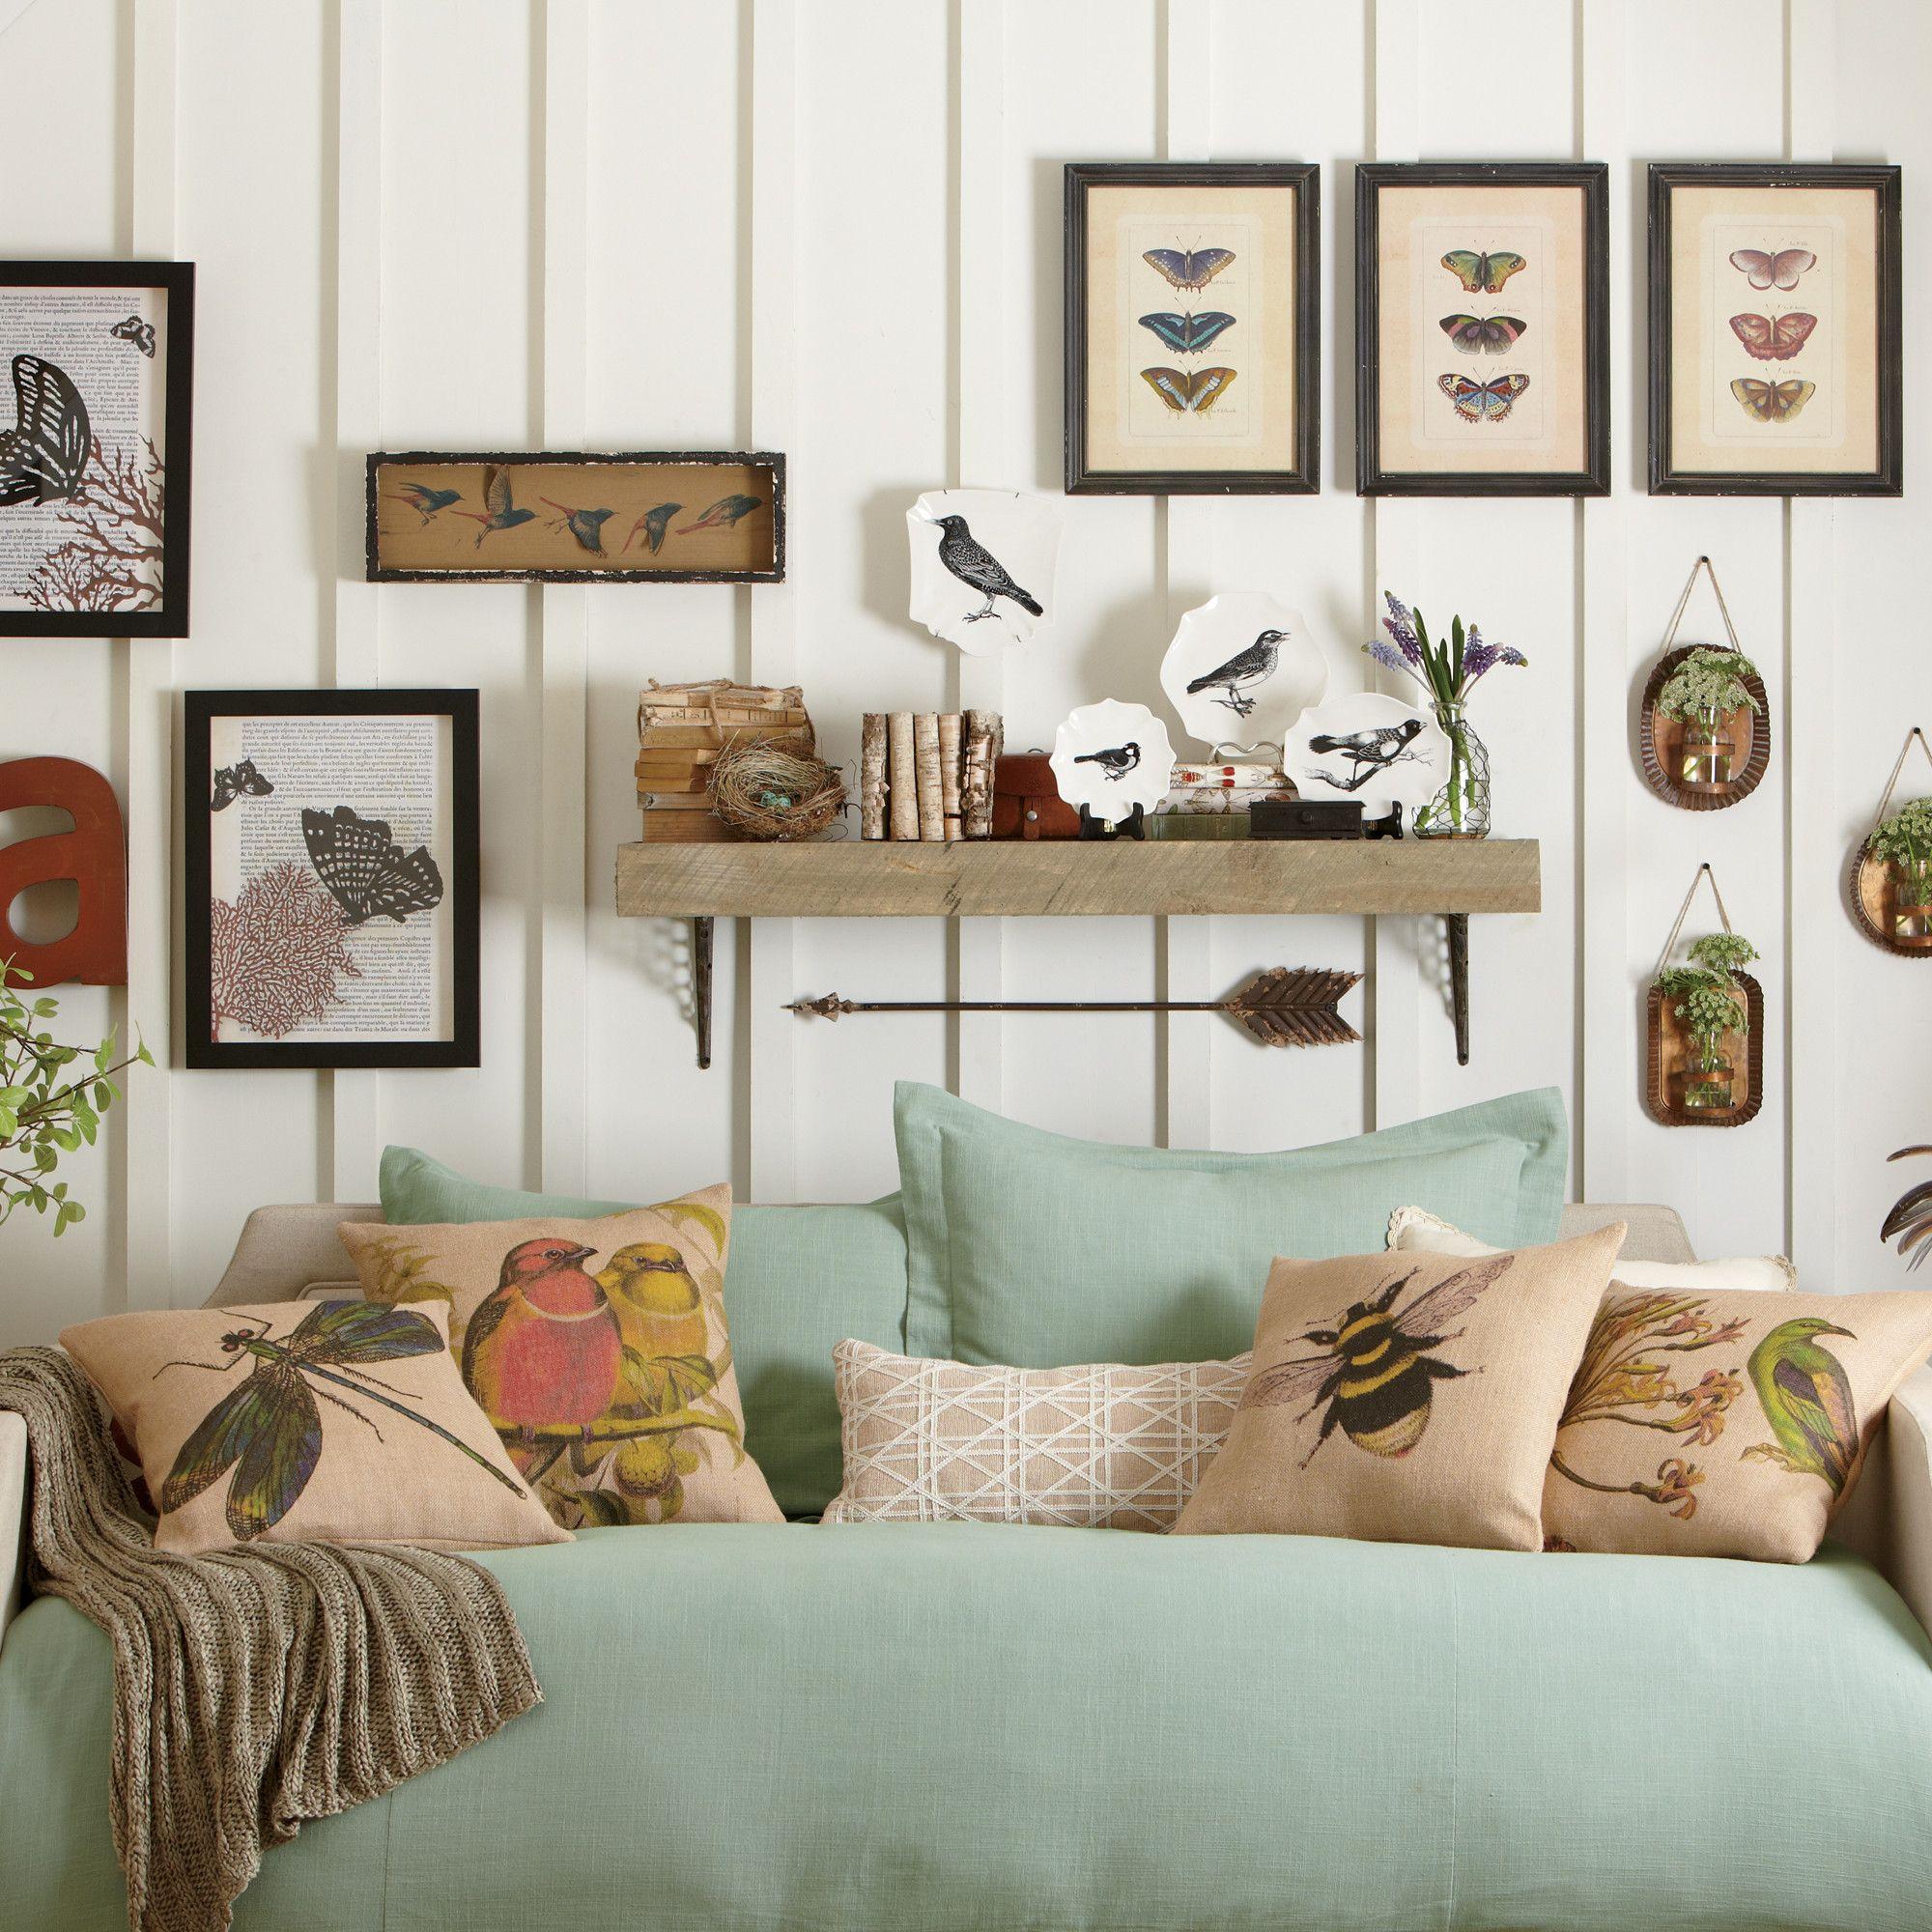 Traditional Furniture Classic Designs Birch Lane Arrow Wall Decor Frame Wall Decor Decor